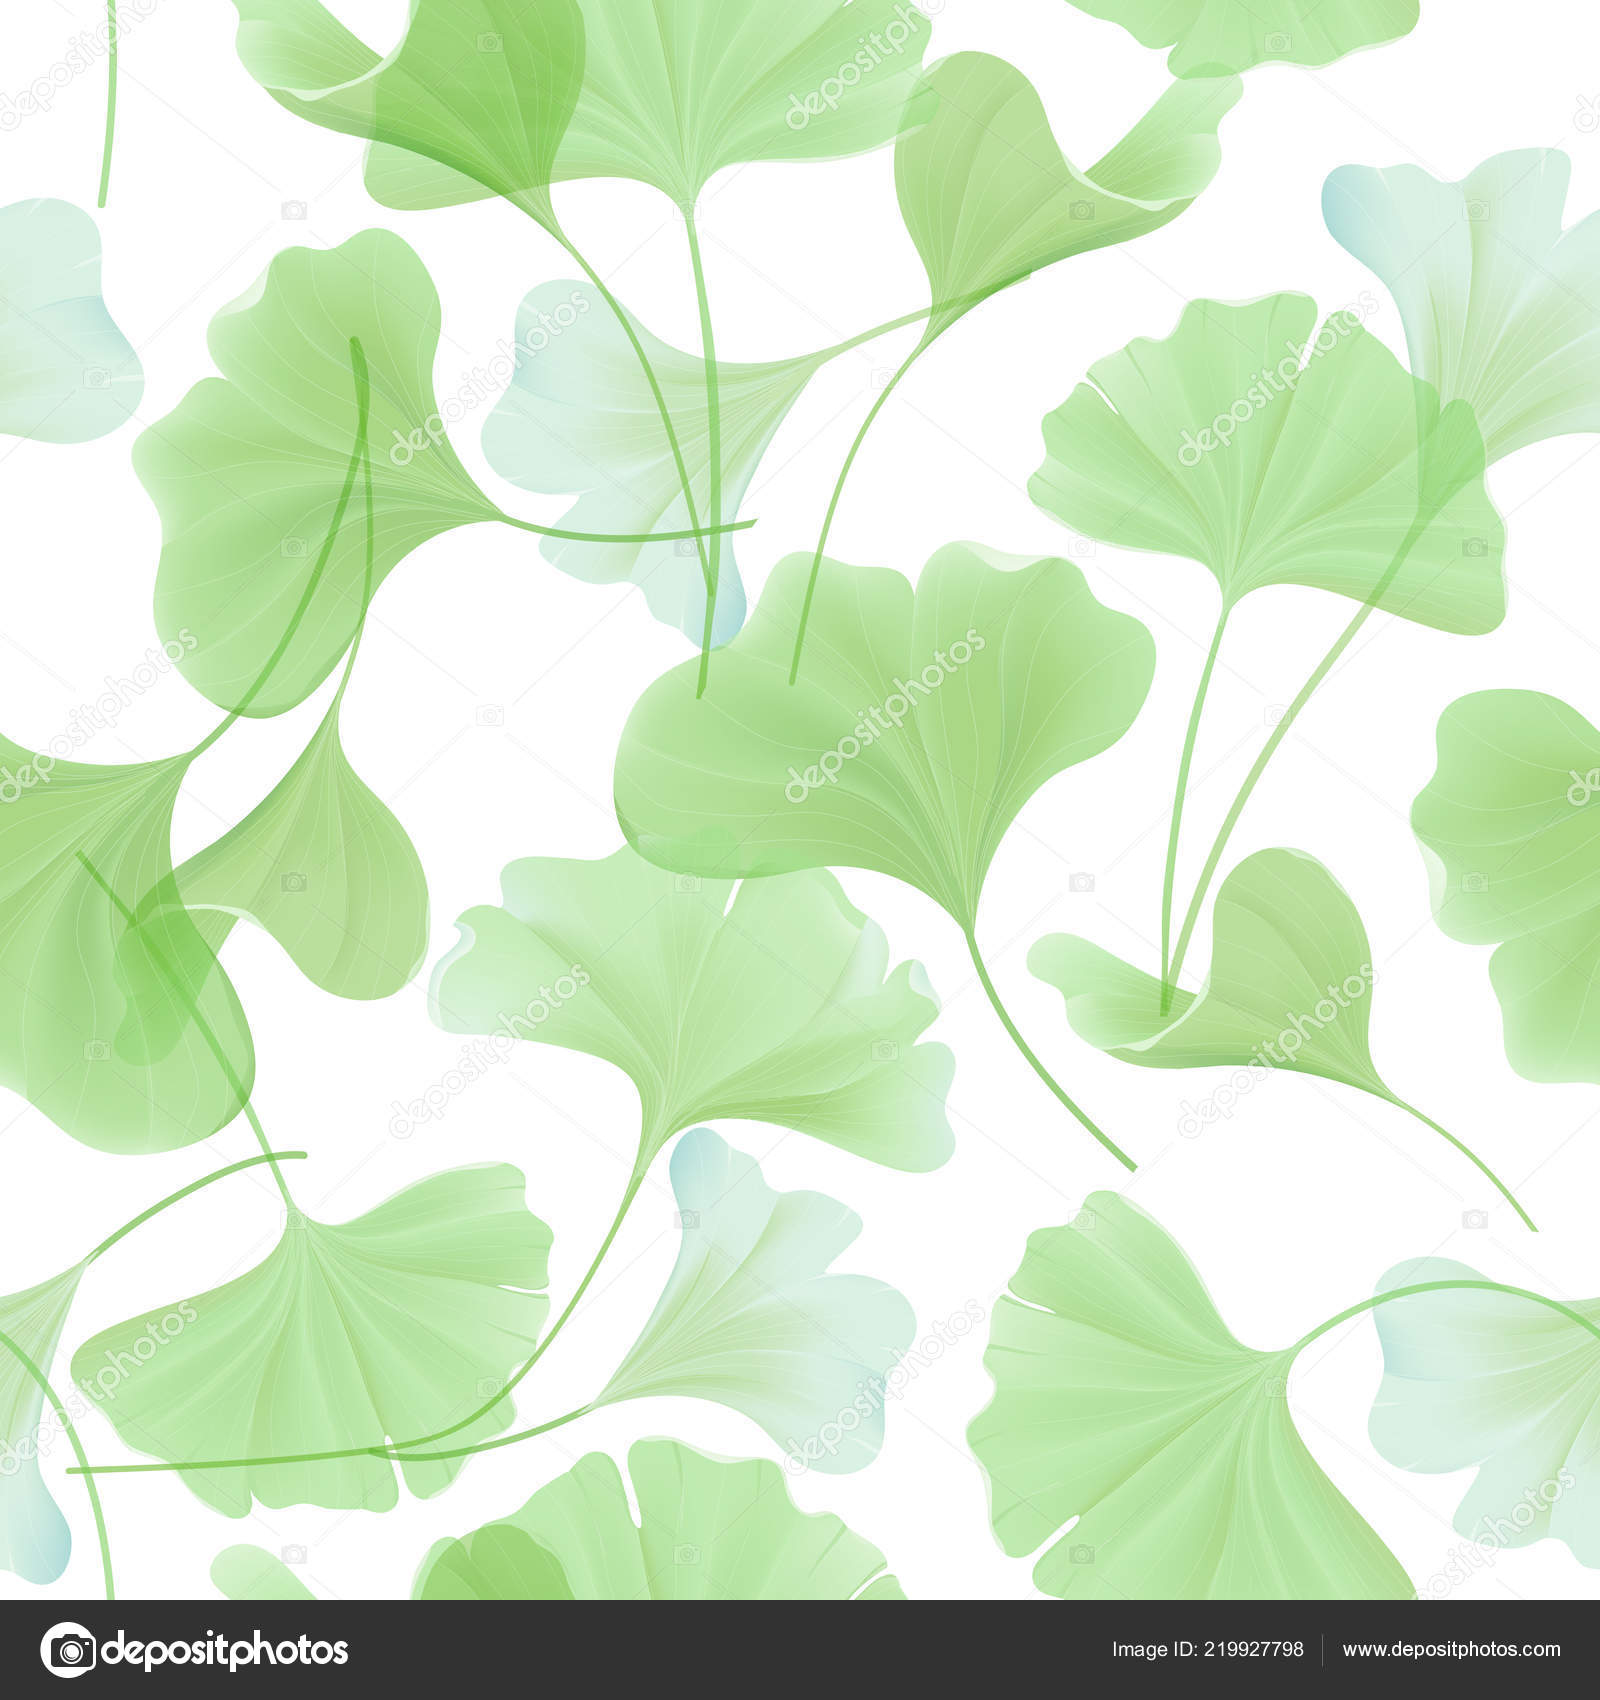 Floral Seamless Pattern With Japanese Gingko Biloba Leaves